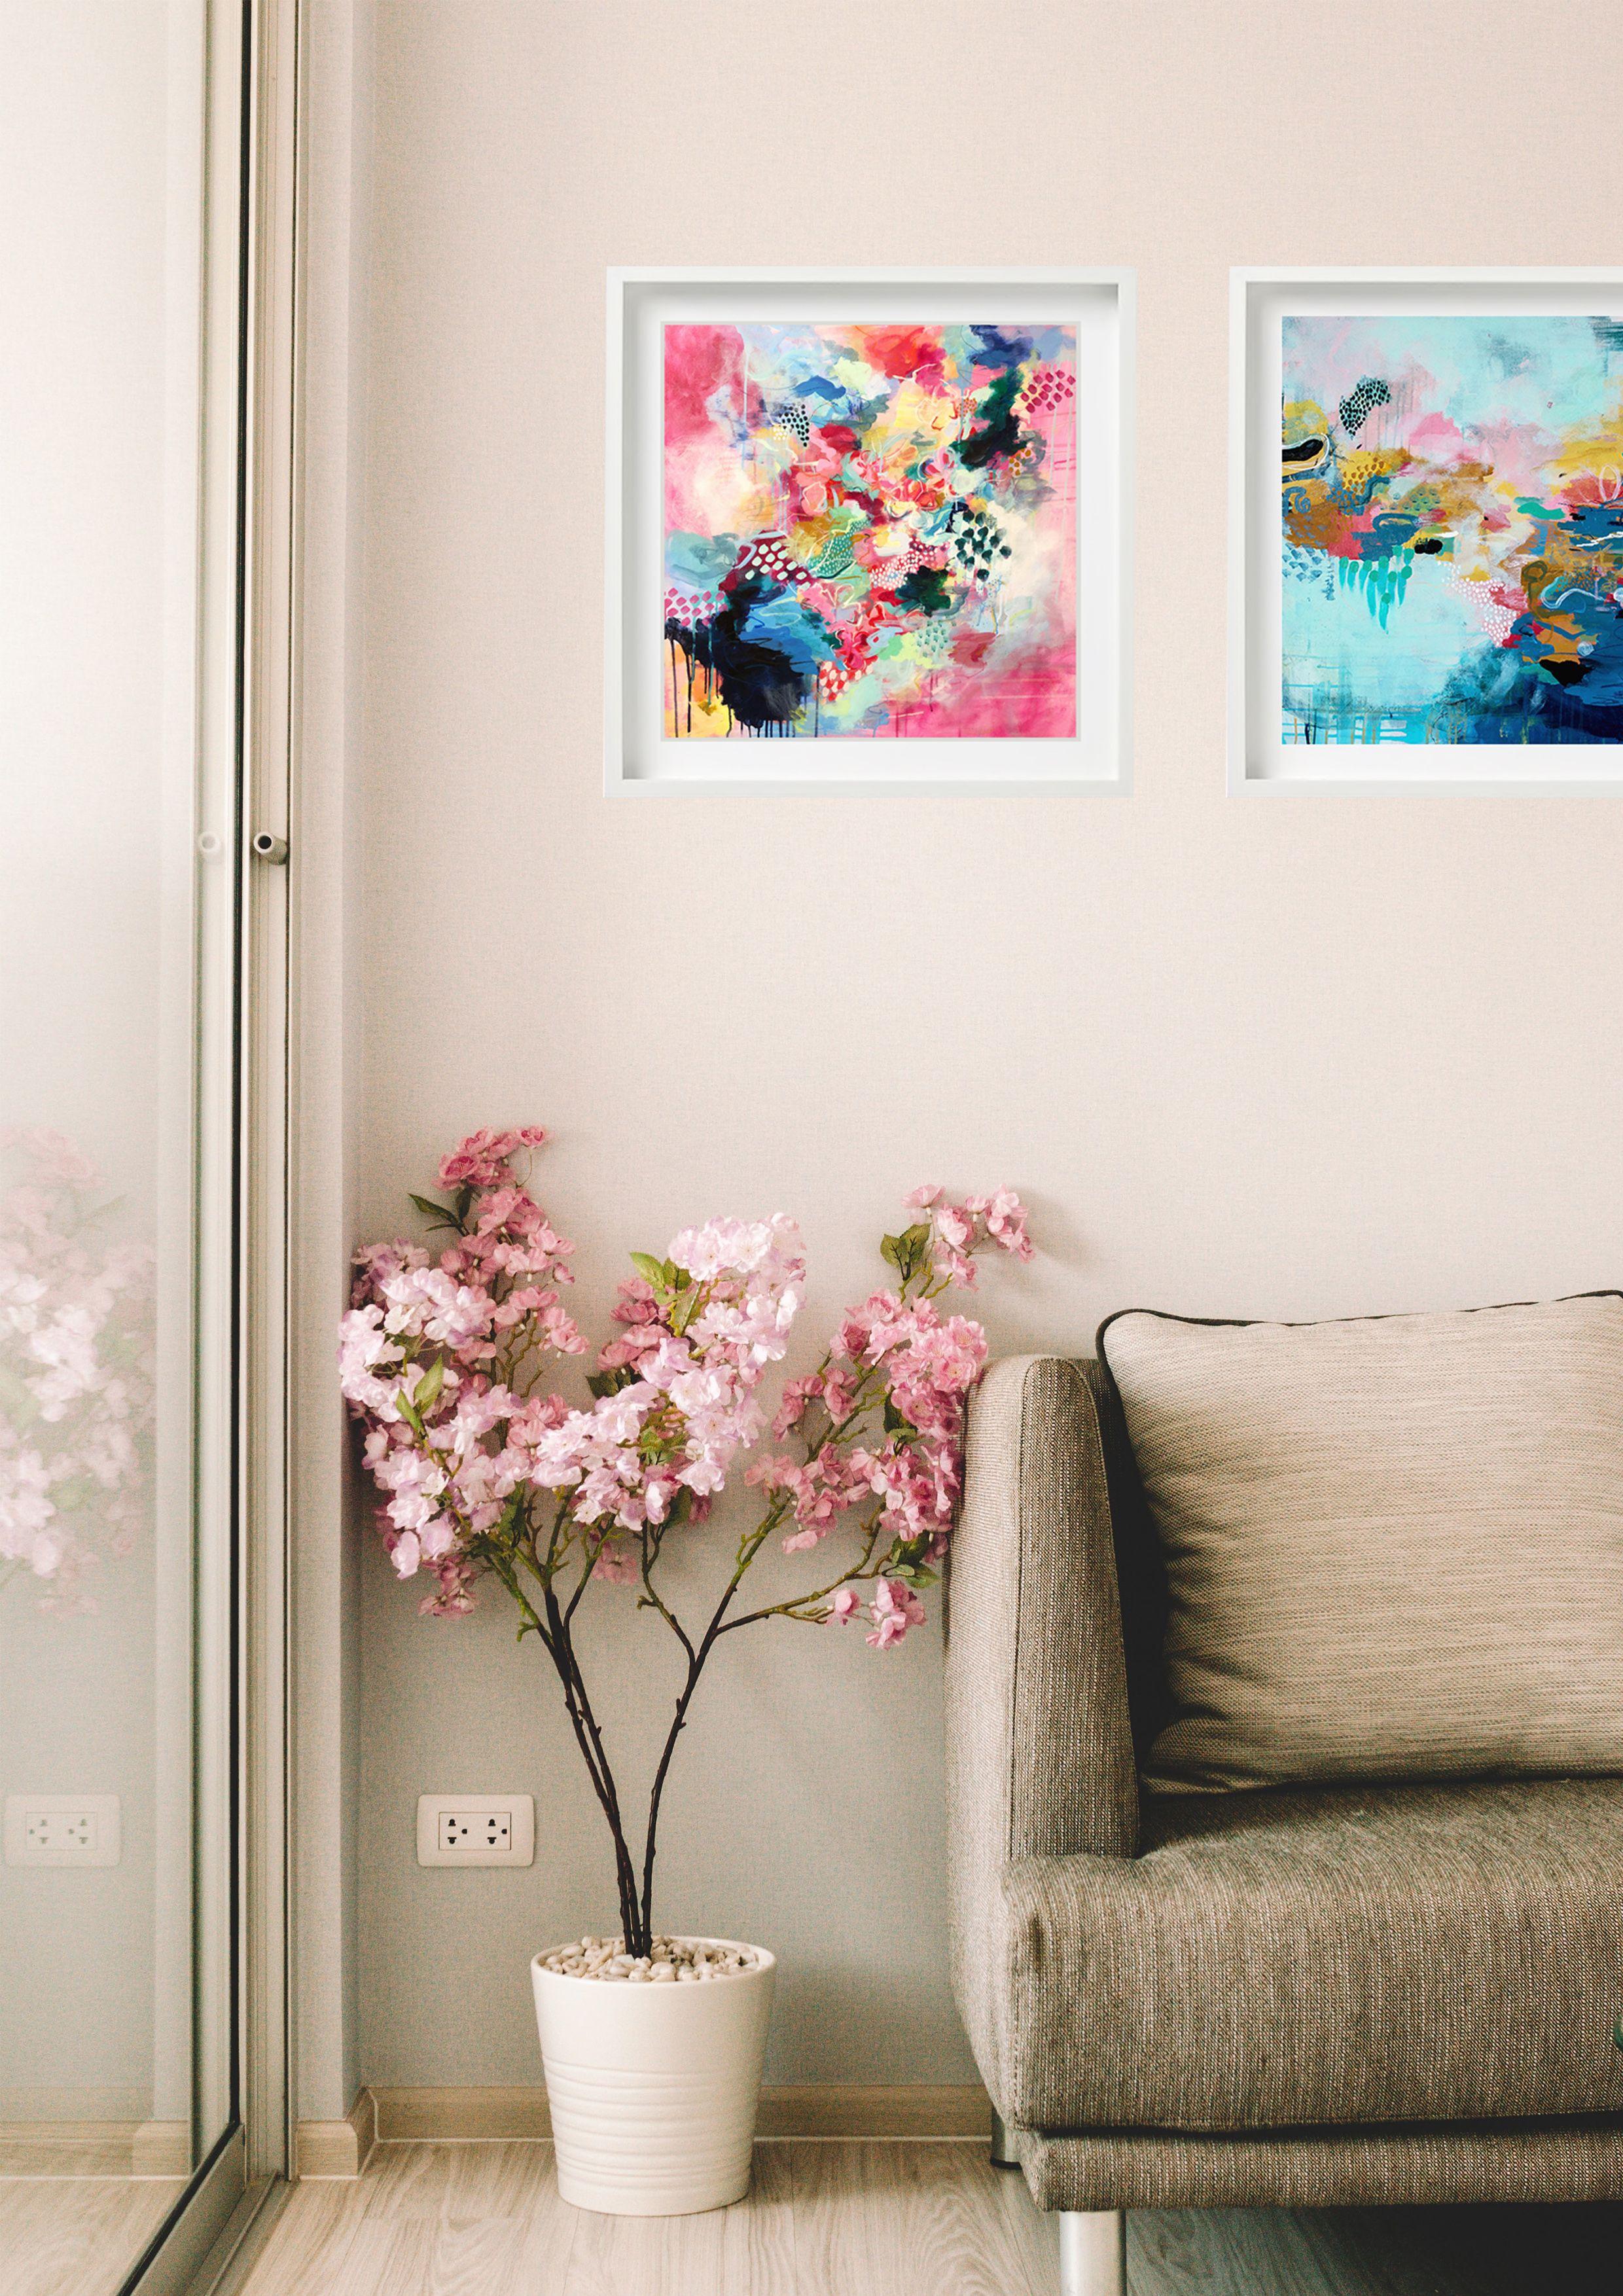 'Seeking Sunset' and 'Finding Life's Joy' Fine Art Prints - Neutral Interior Insp  #interiorinspo #abstractart #colourinspo #jessicaslackstudio